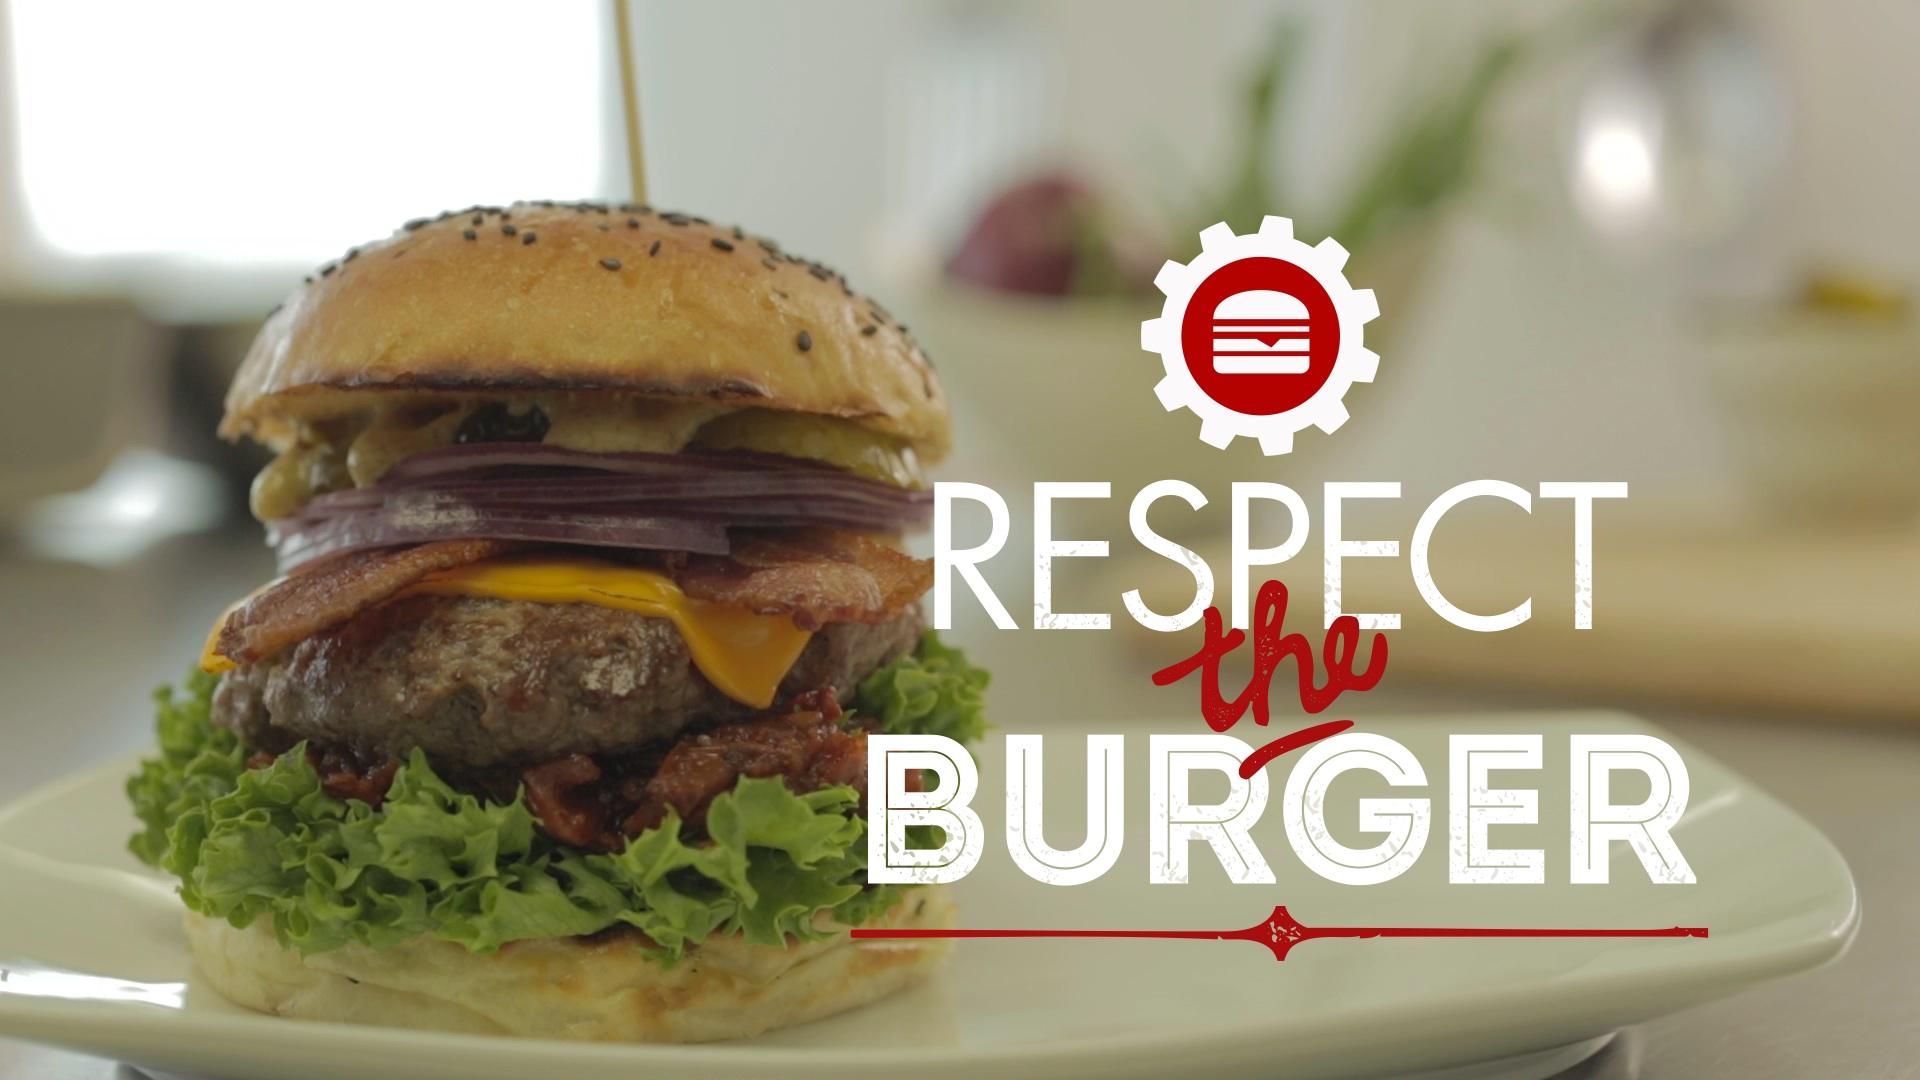 RESPECT THE BURGER - GRIND MODERN BURGER